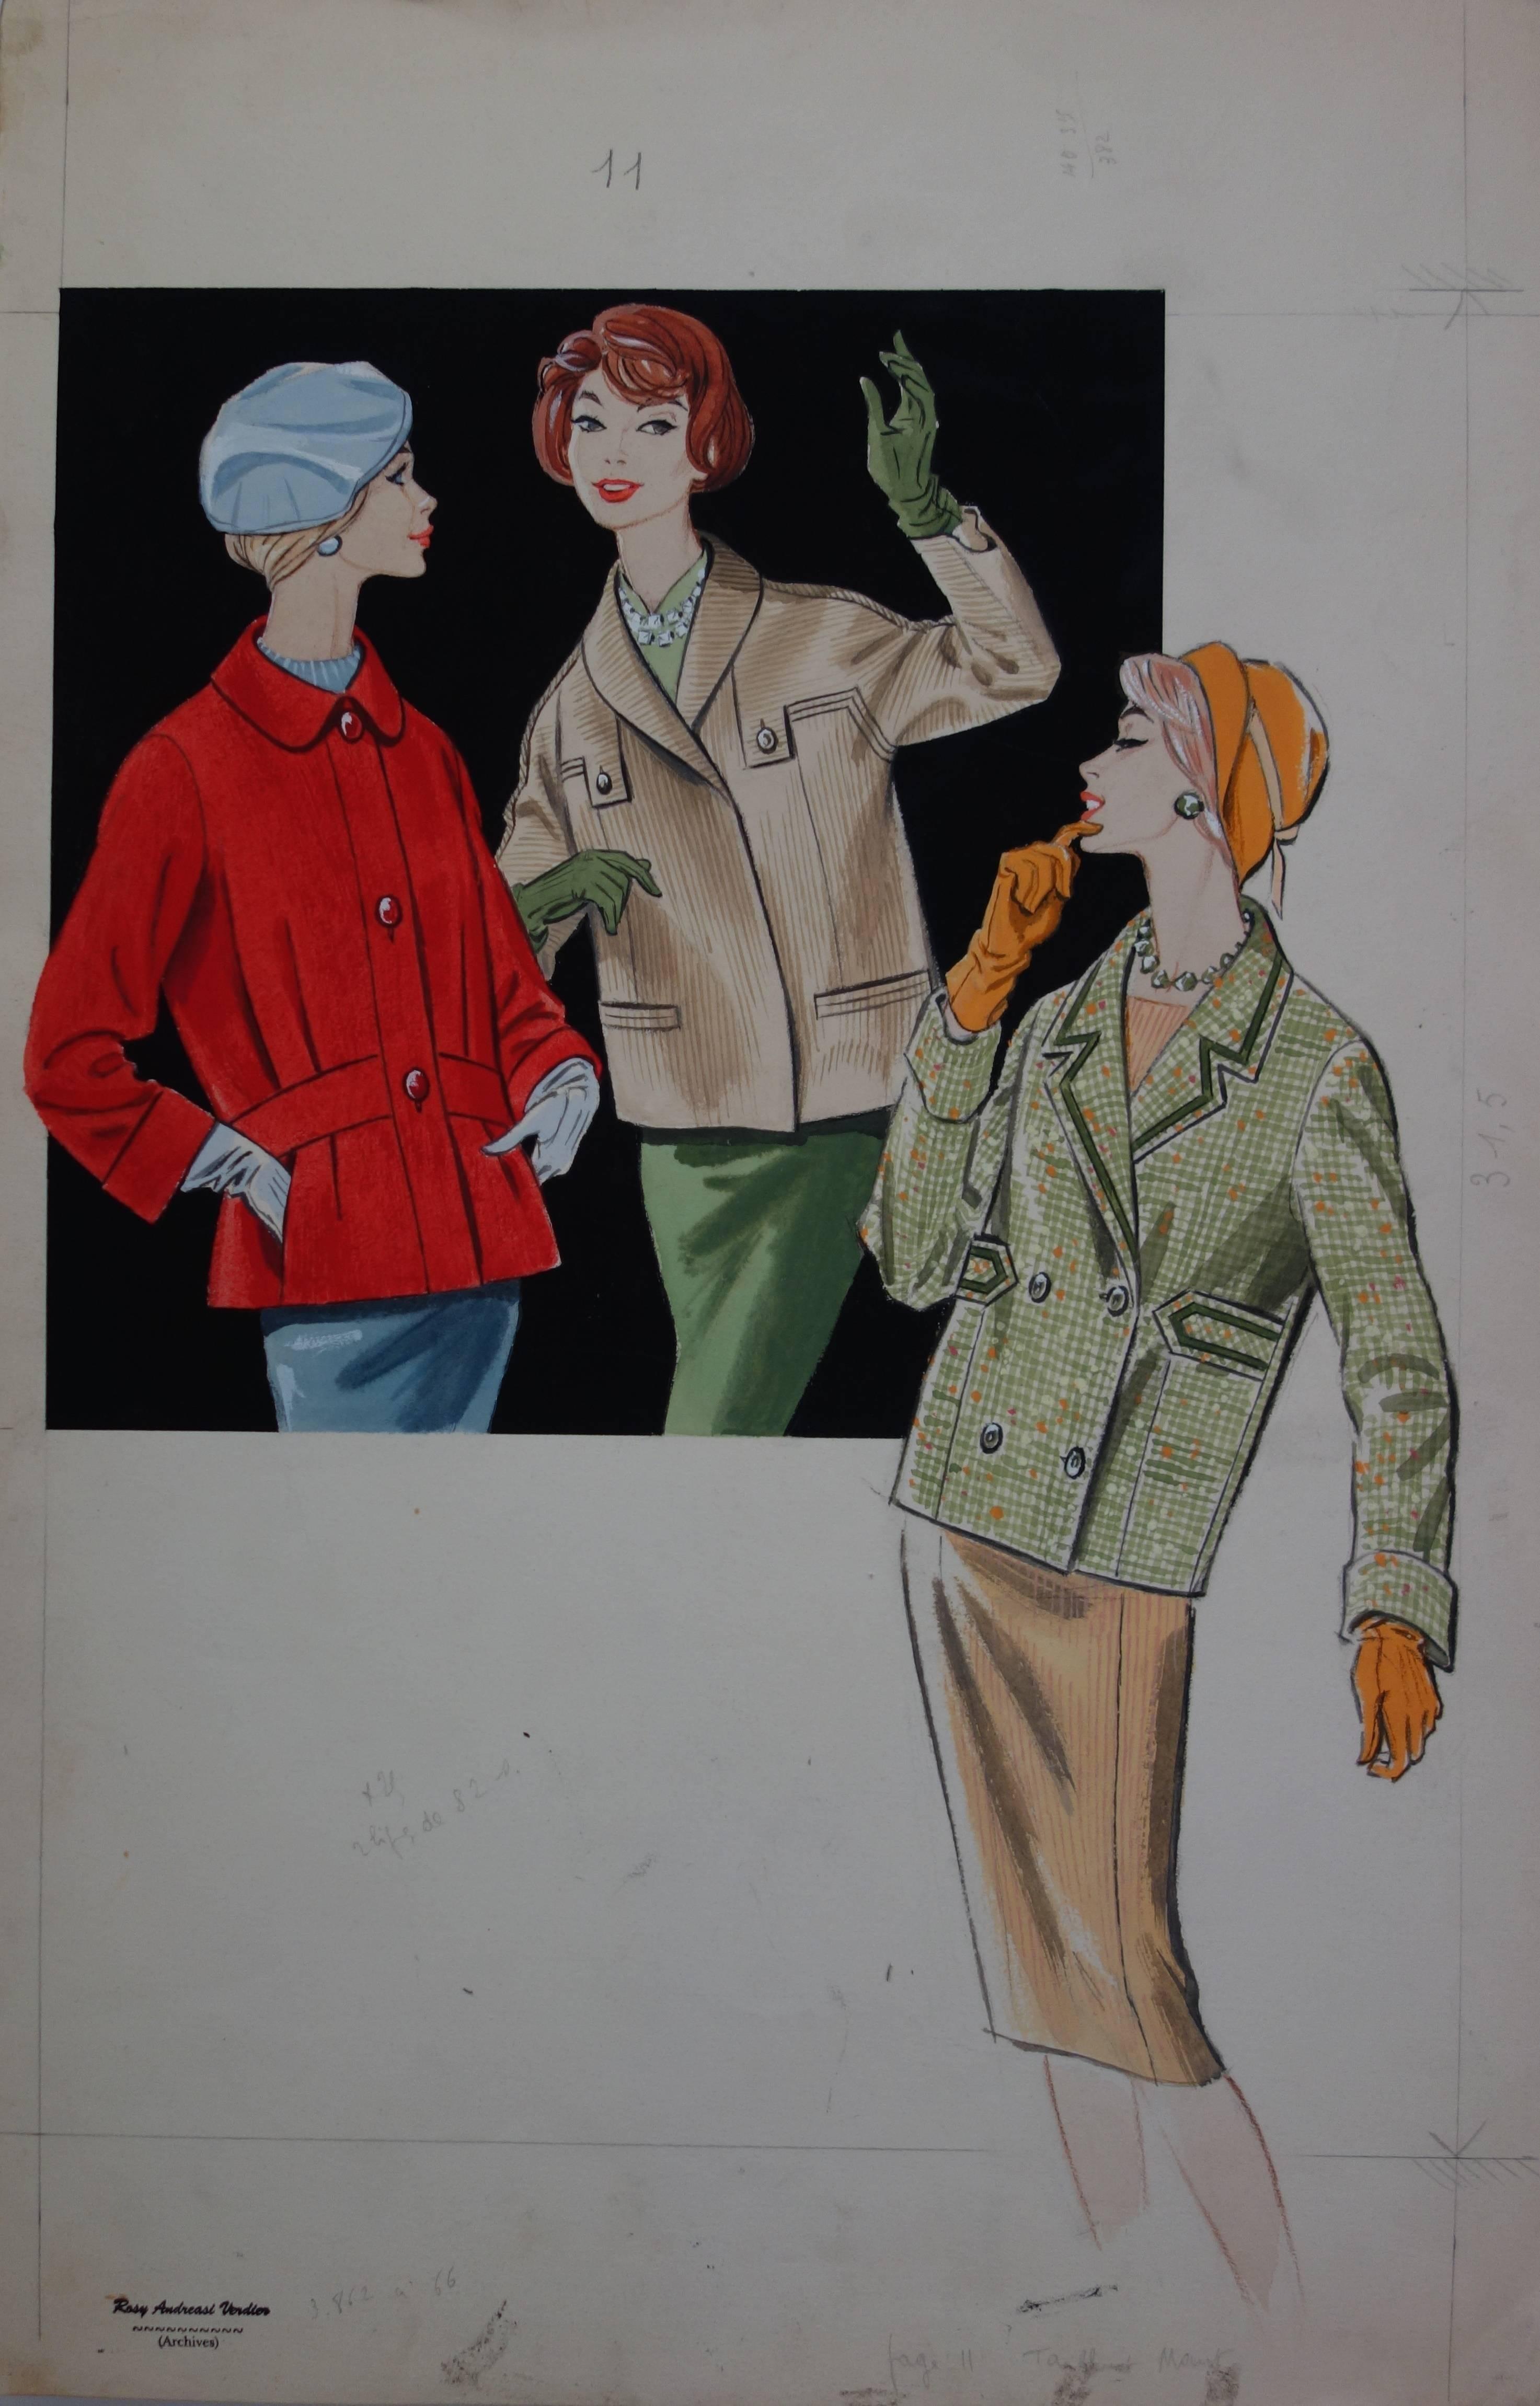 Mode drawing : Three Elegant Women - Original watercolor and gouache drawing